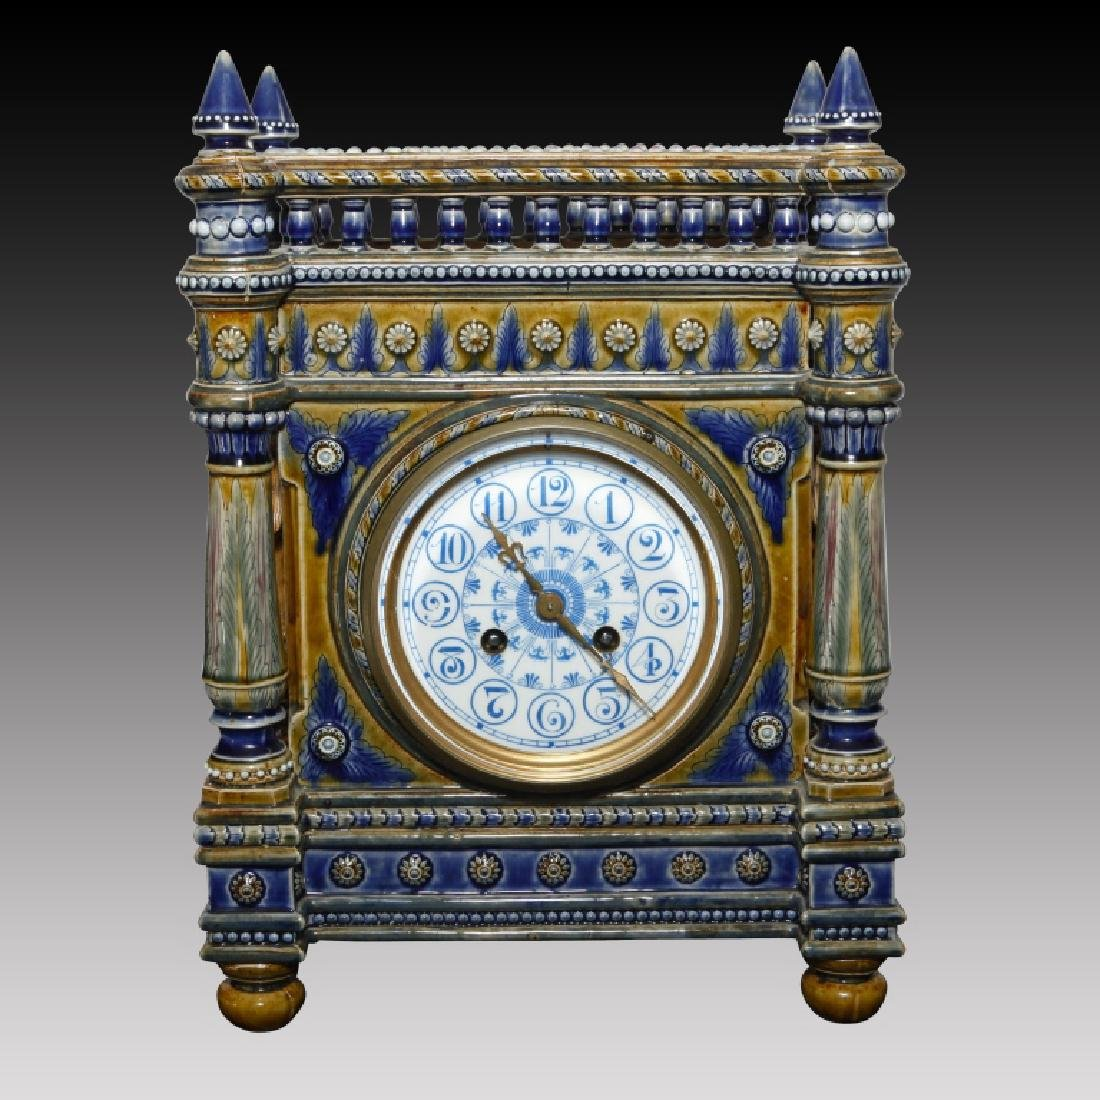 Monumental Doulton Tinworth Cherub Mantel Clock